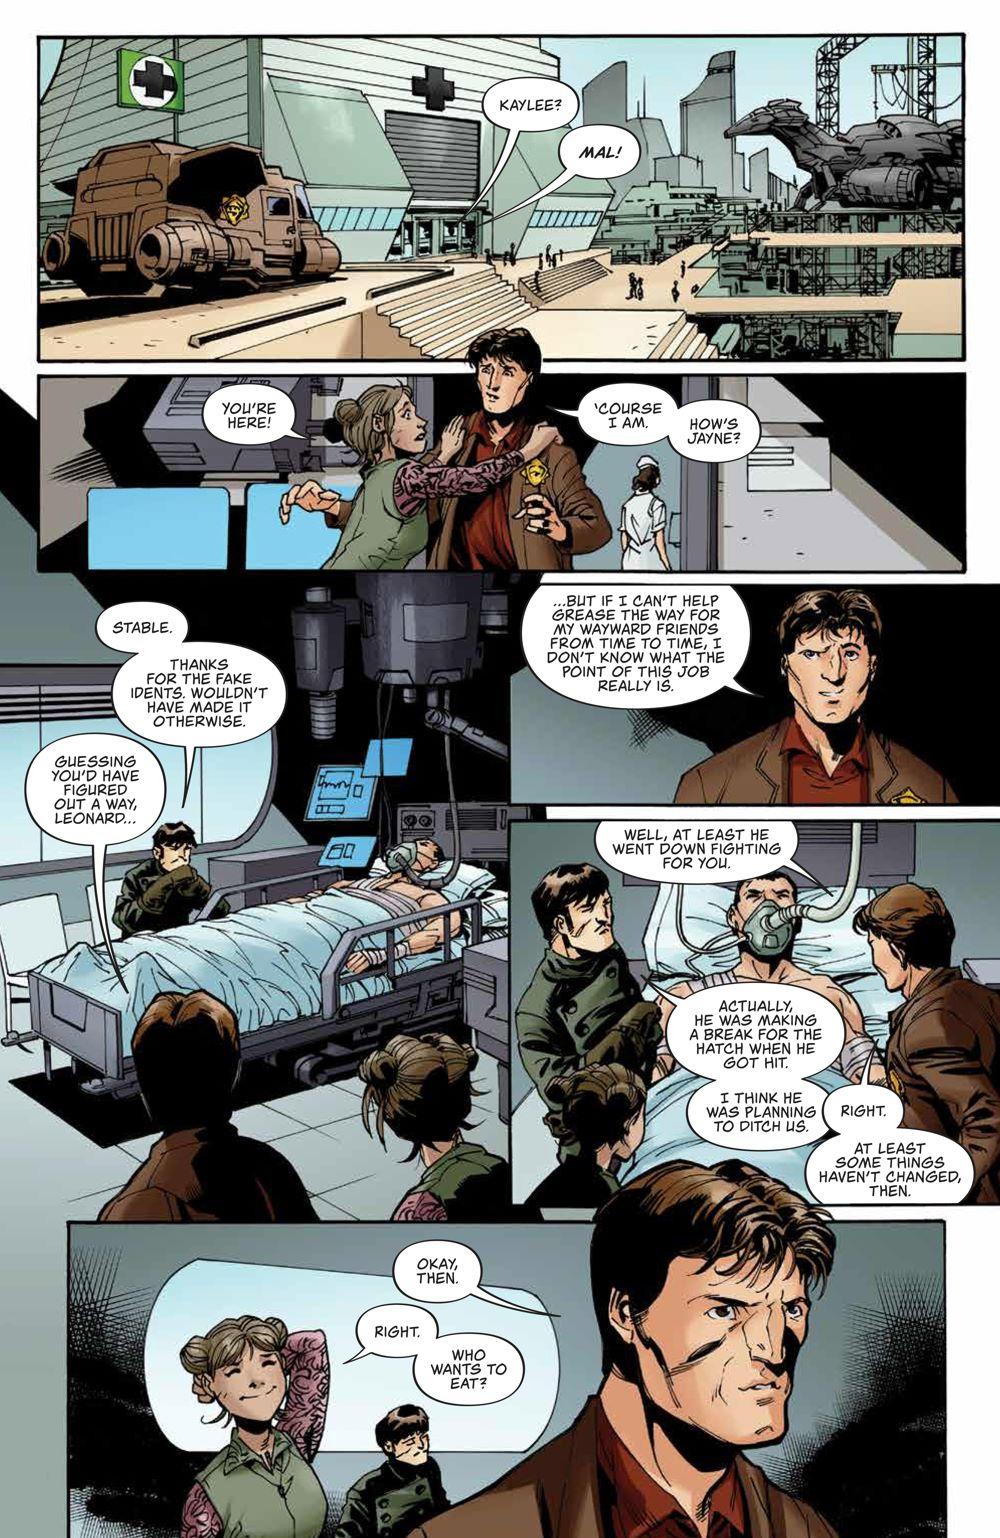 Firefly_NewSheriffVerse_v2_HC_PRESS_21 ComicList Previews: FIREFLY NEW SHERIFF IN THE 'VERSE VOLUME 2 HC